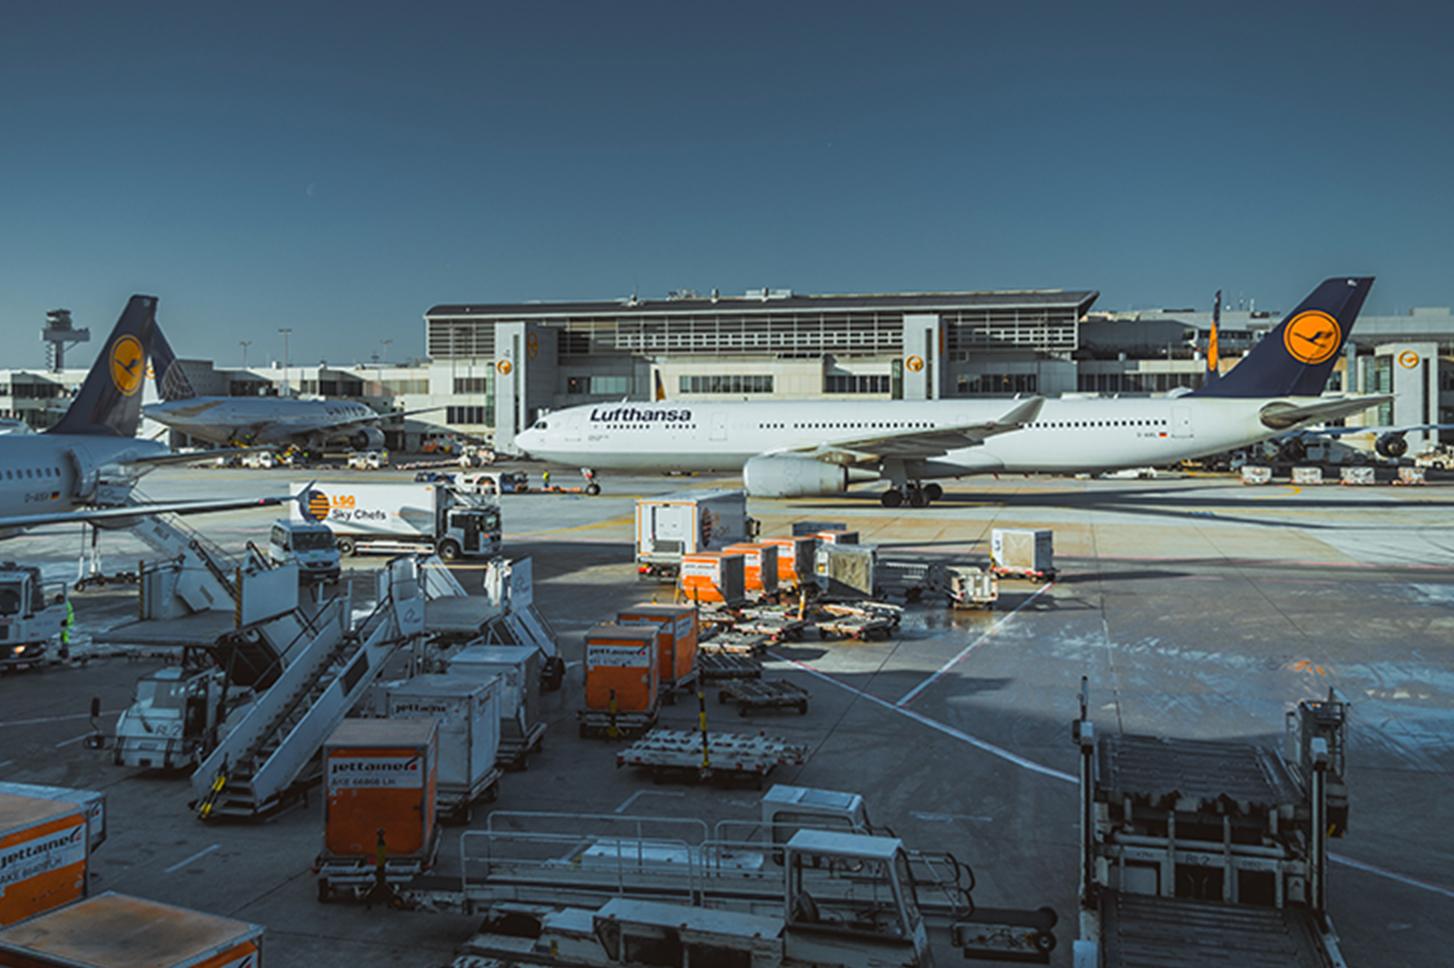 Lufthansa planes in Frankfurt Airport tarmac.